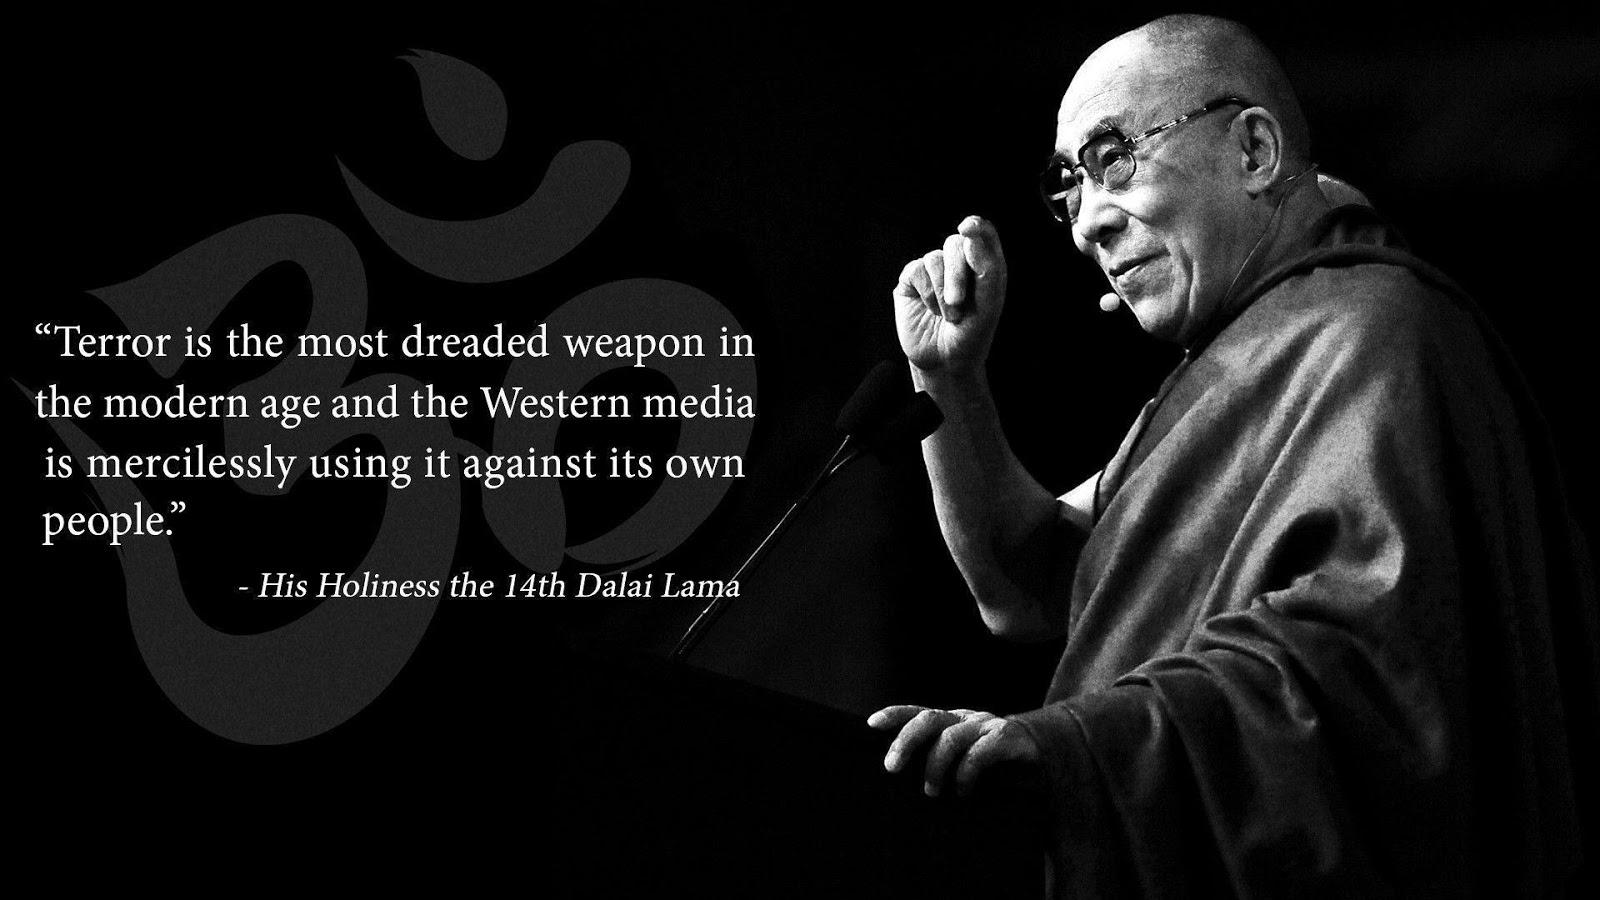 Dalai Lama Wallpapers